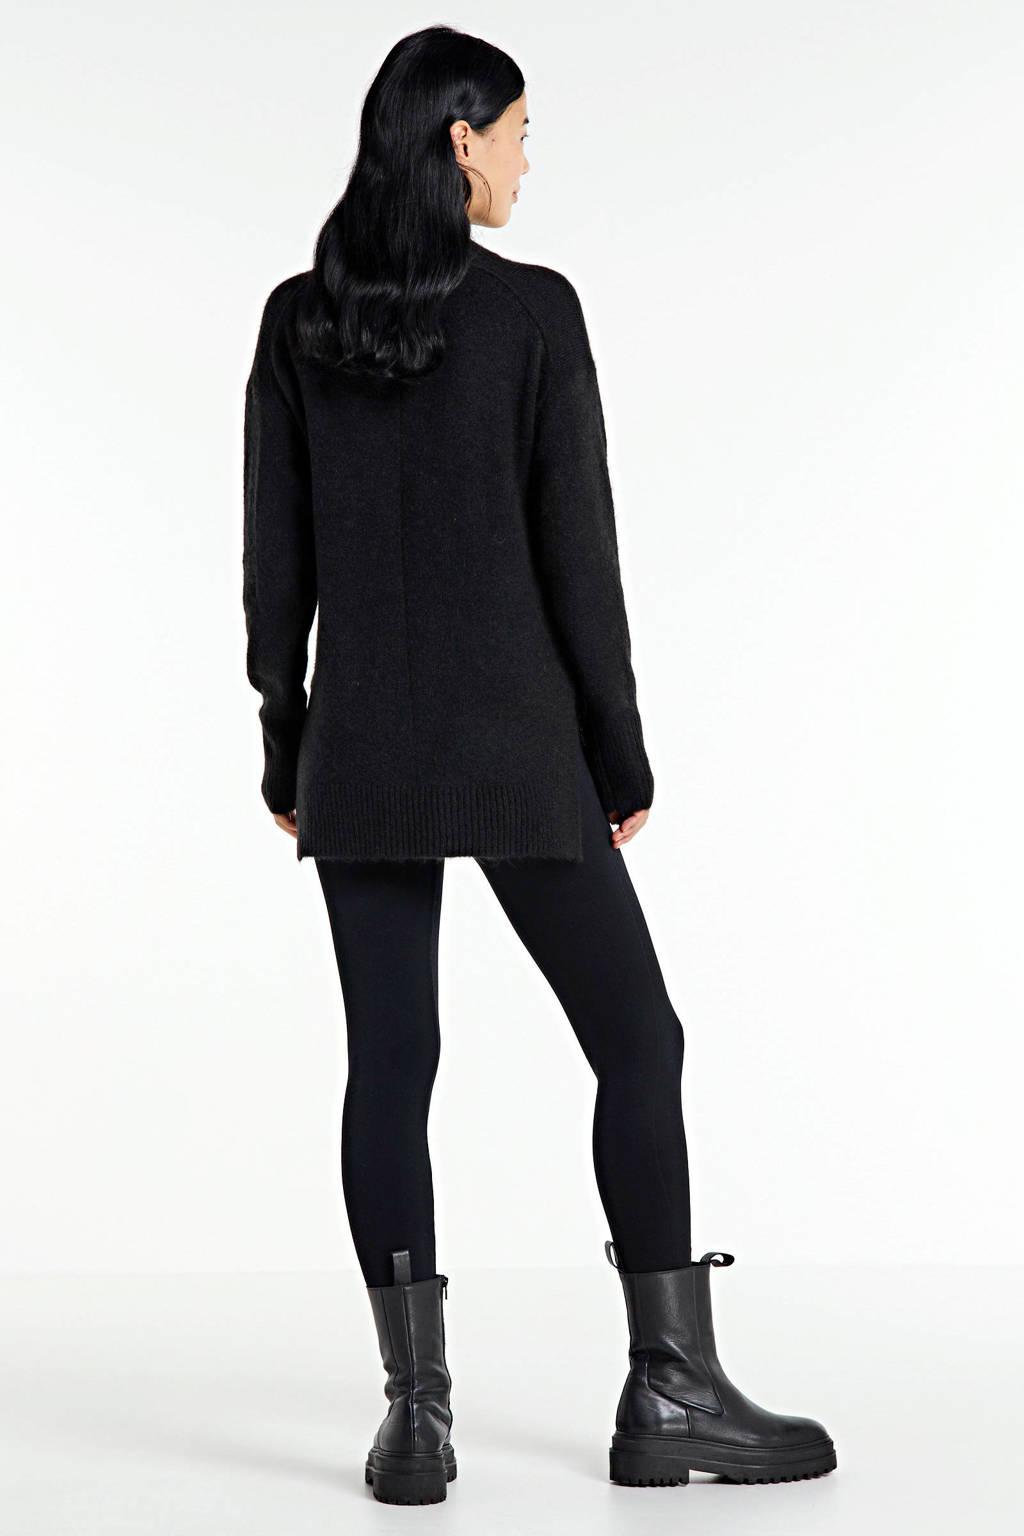 Soaked In Luxury gemêleerde trui Angel zwart melange, Zwart melange